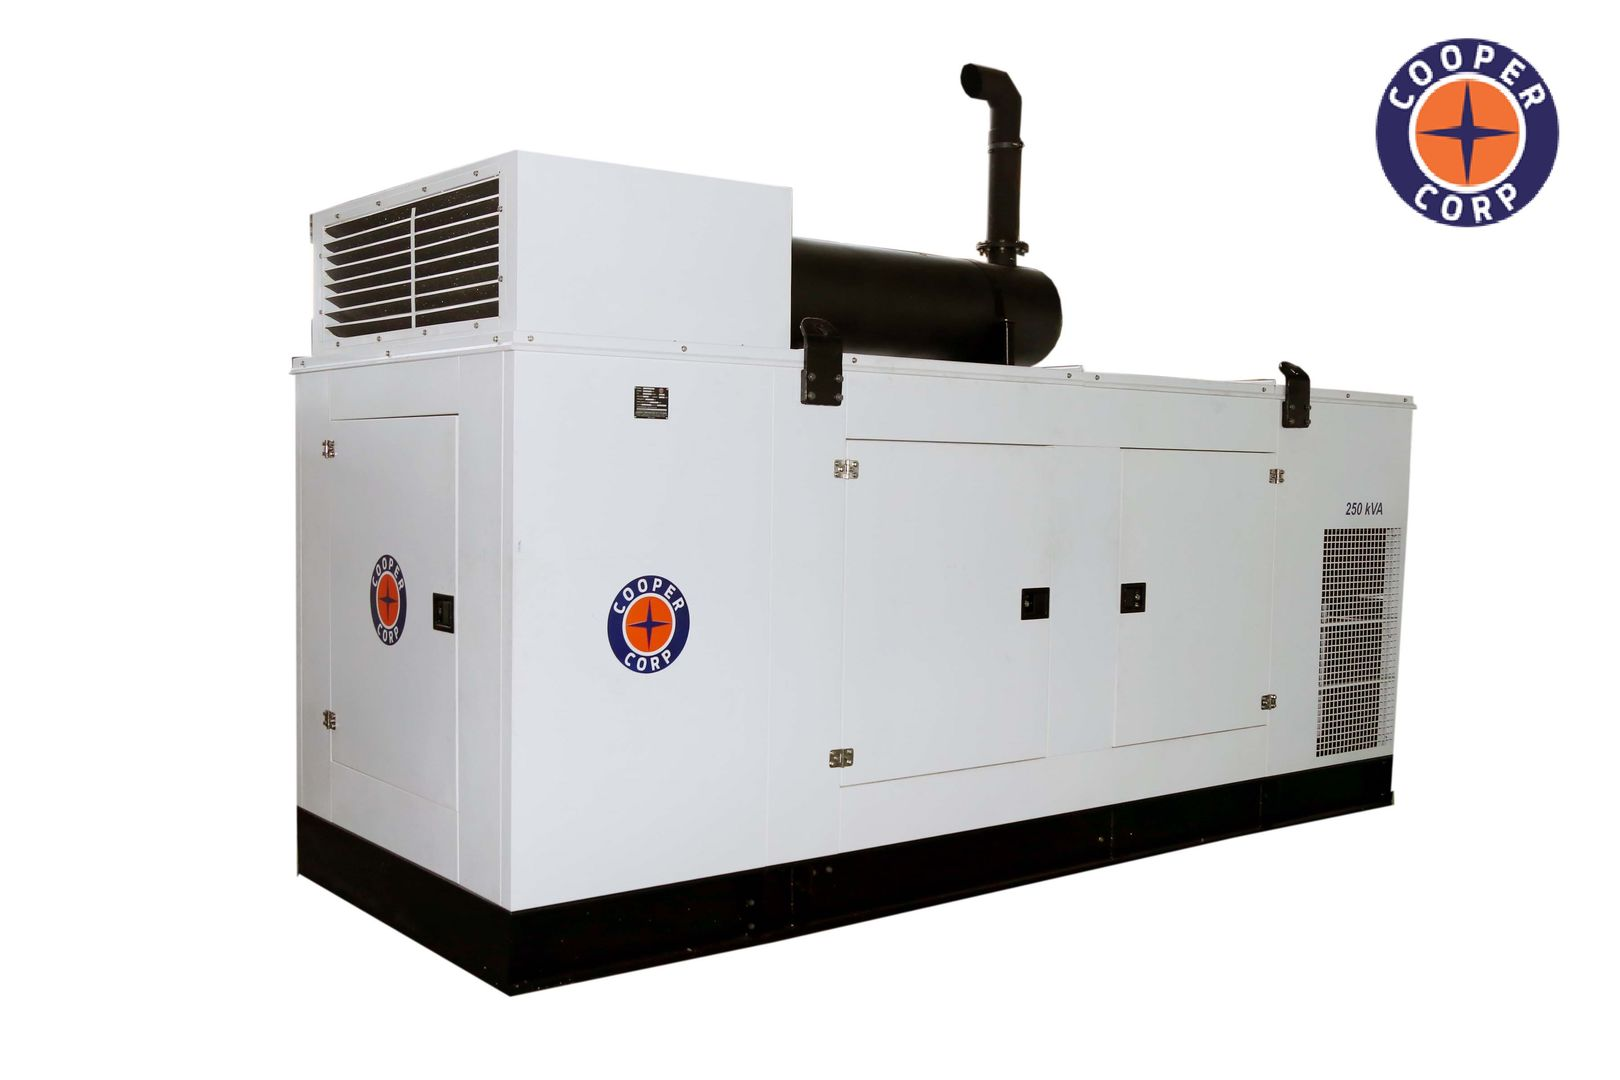 Generator Manufacturers in India | Cooper Corp